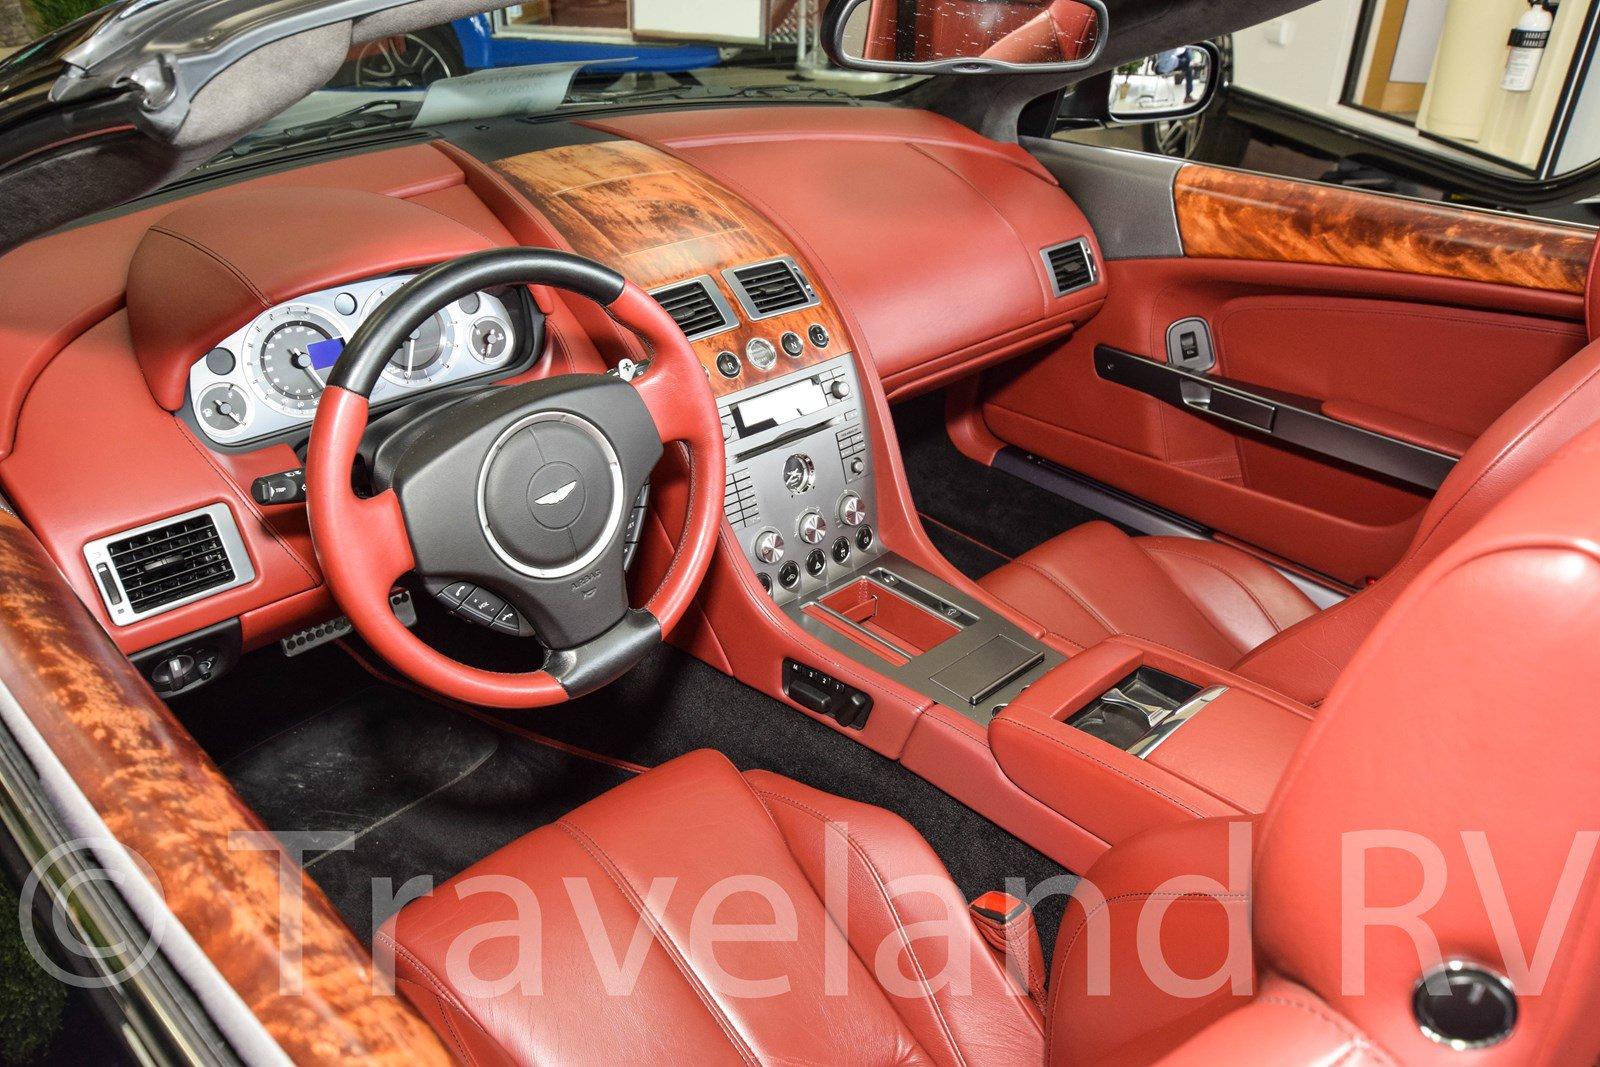 2008 Aston Martin Db9 DB9 VOLANTE Thumbnail